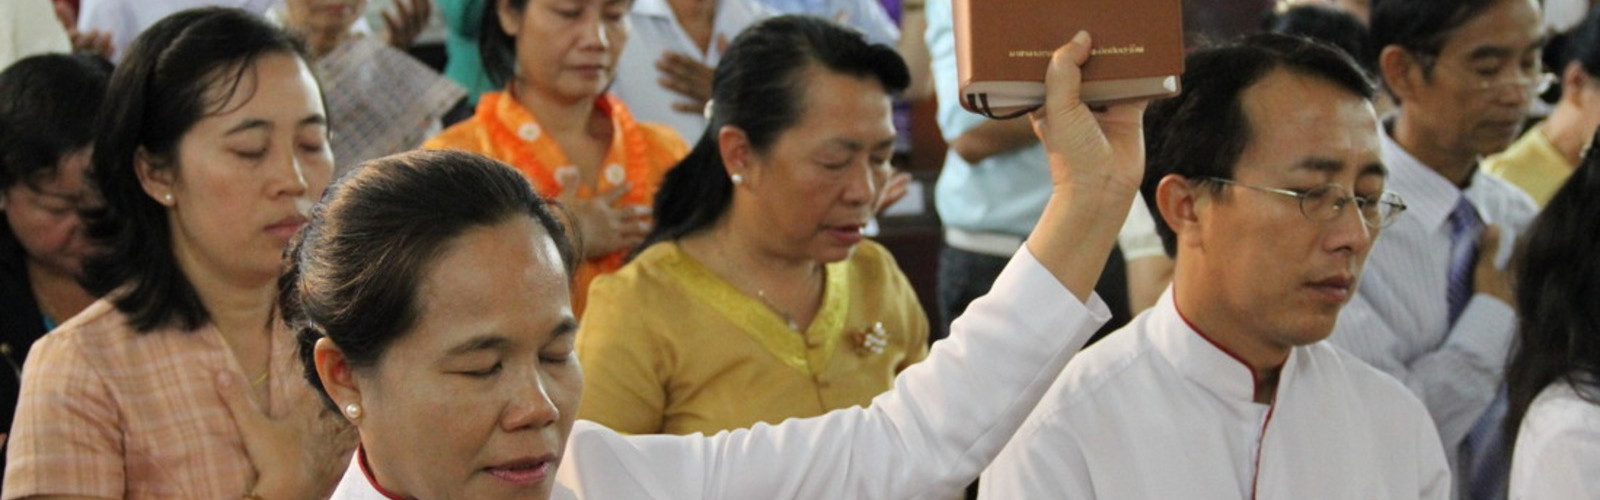 ACN LAOS cristiani arrestati ok